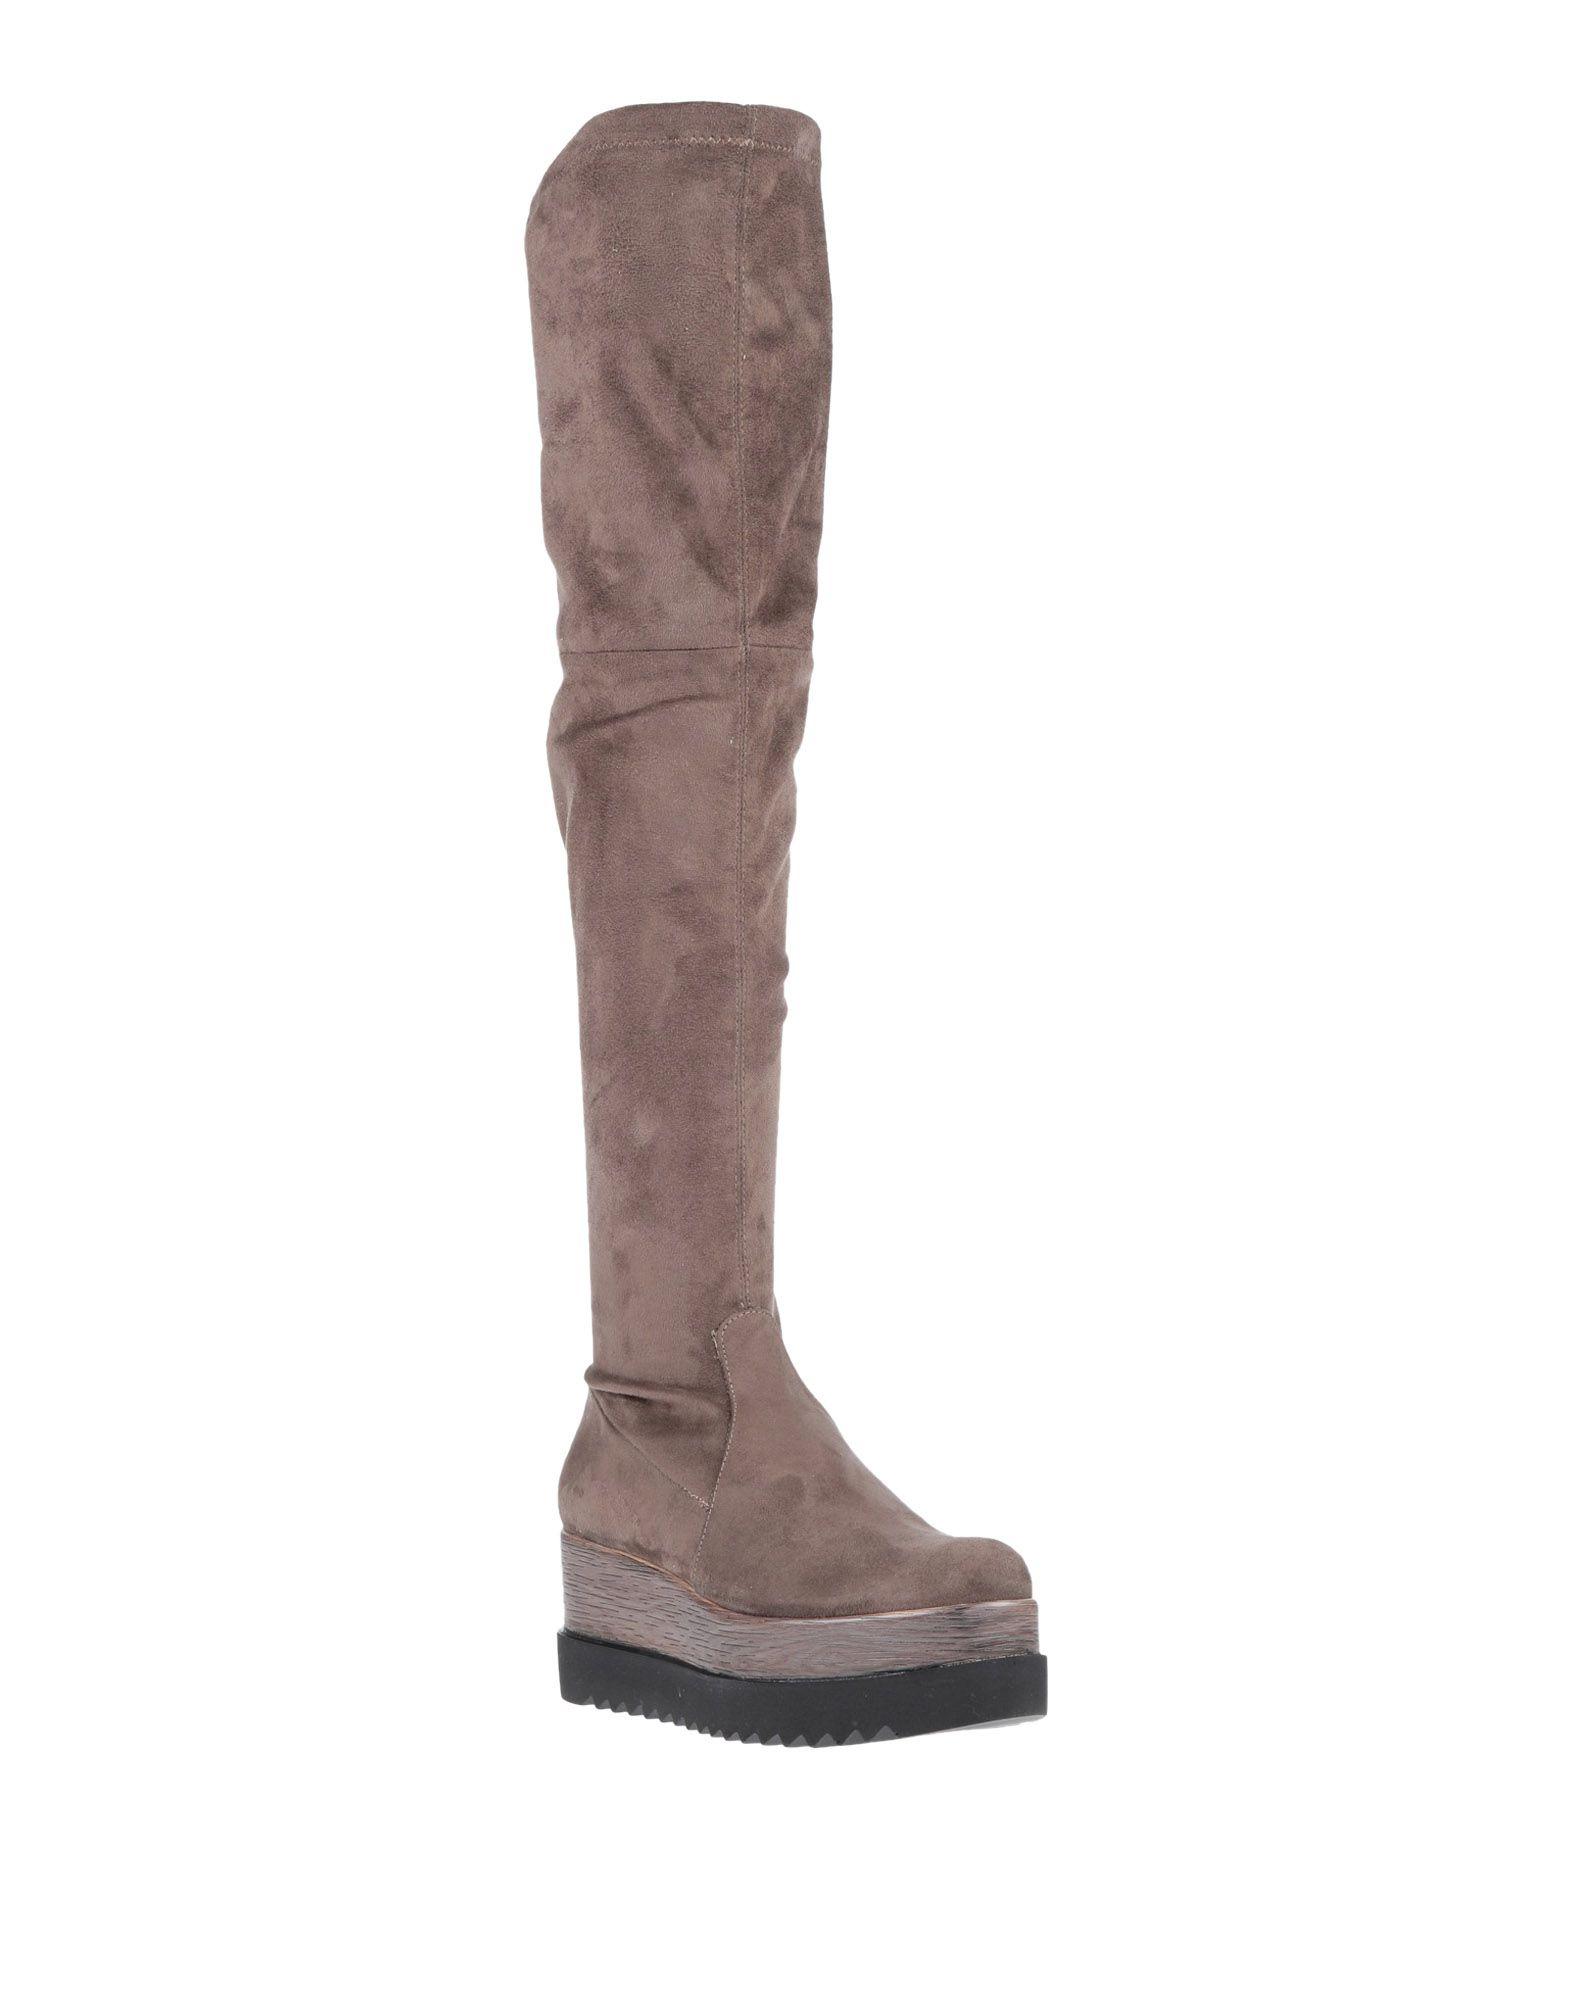 Exe' Stiefel Damen  11529551BM Gute Qualität beliebte Schuhe